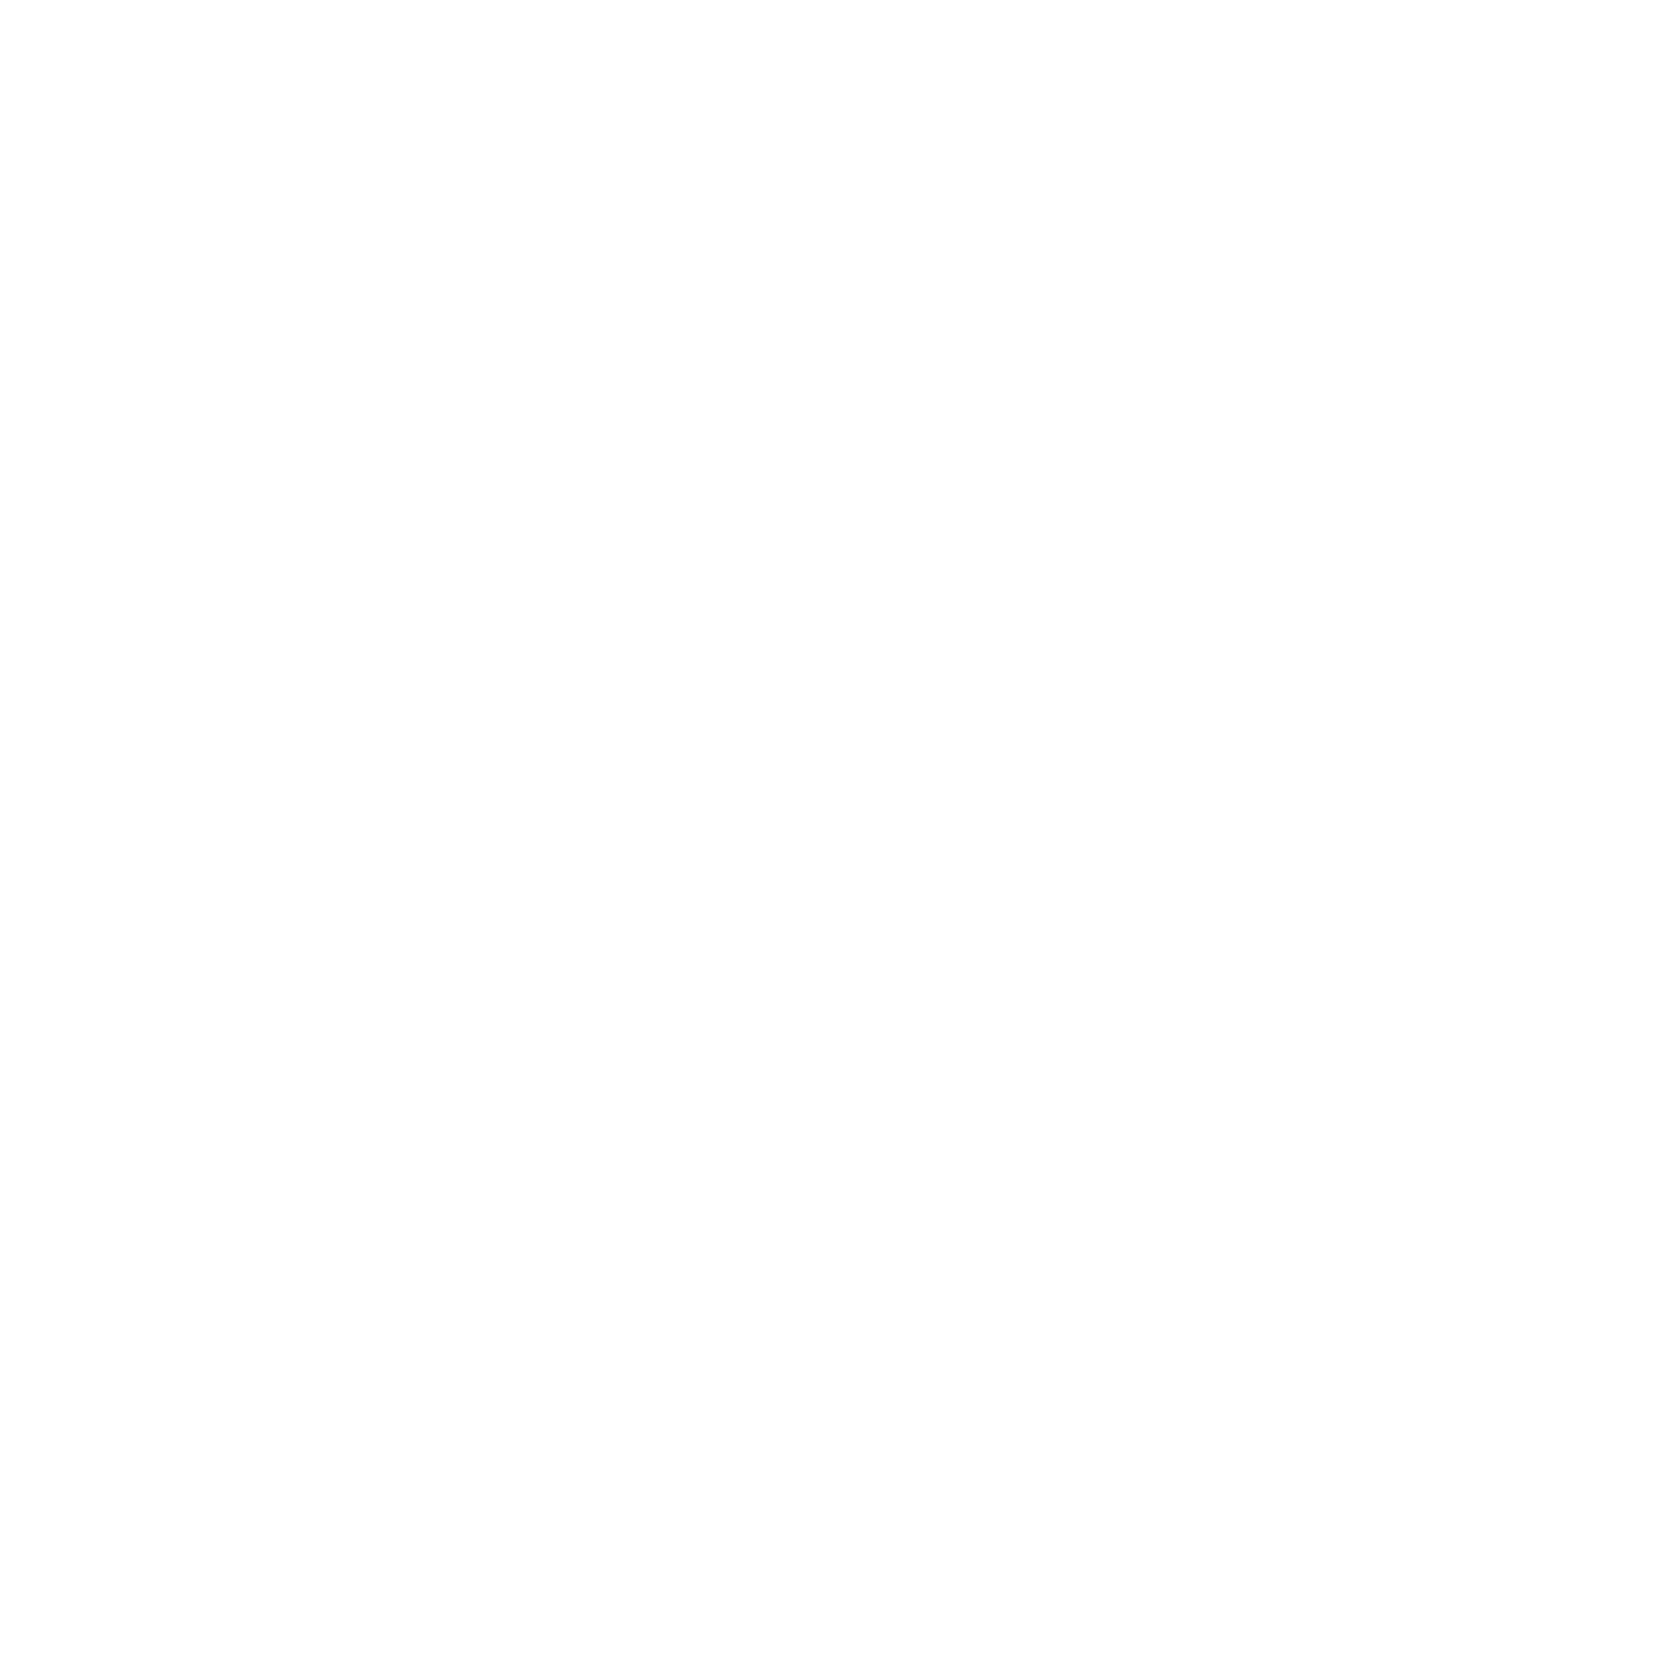 Micron white M encircled with slanted white line